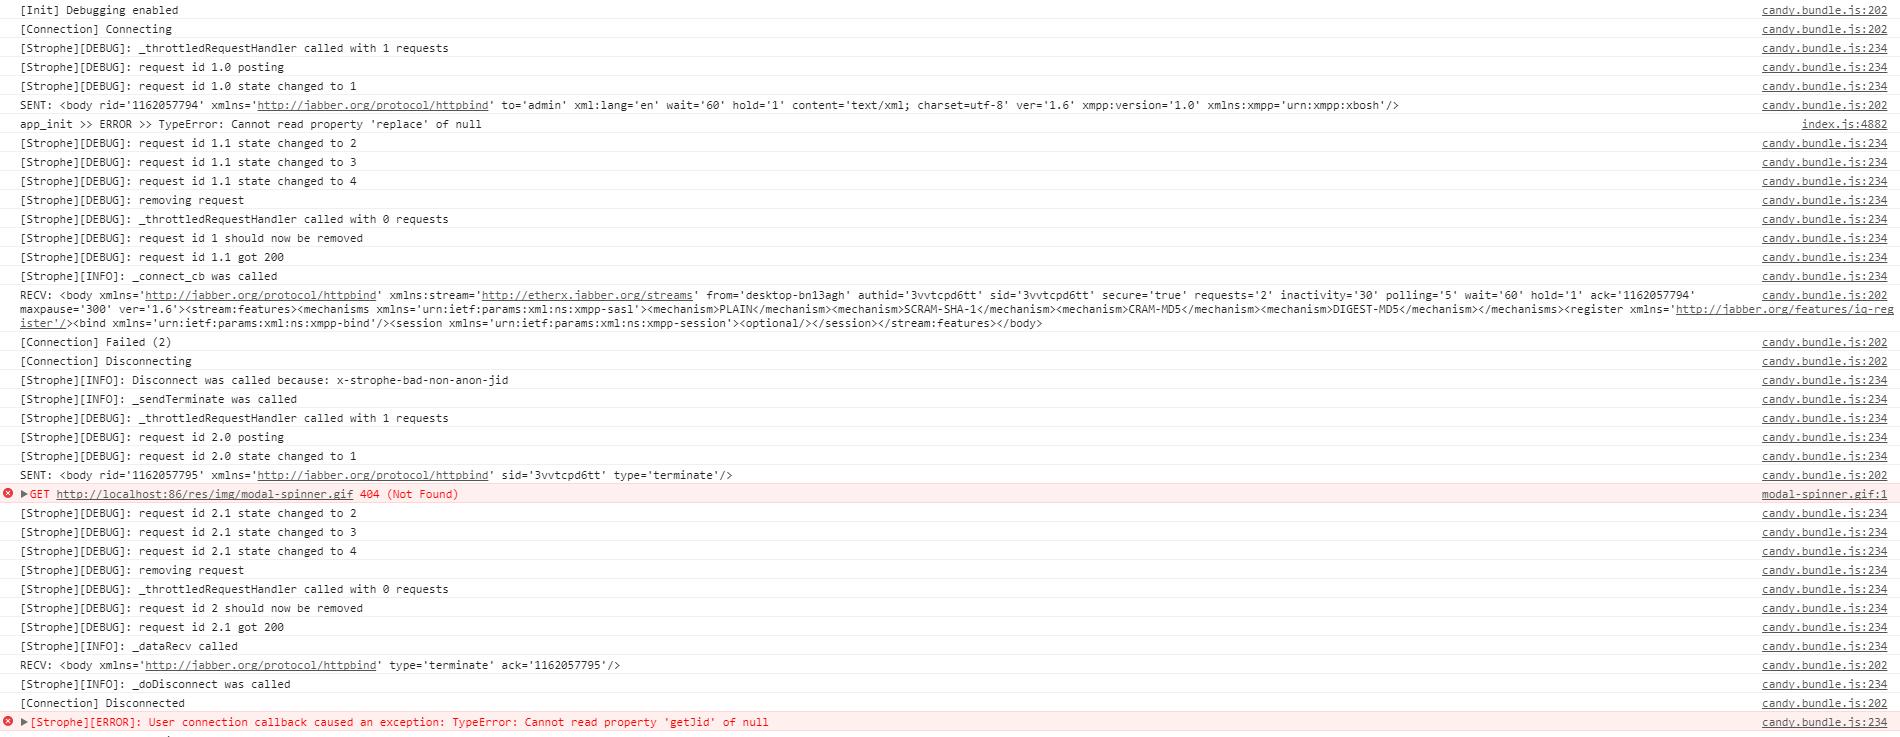 candy - google chrome output with error